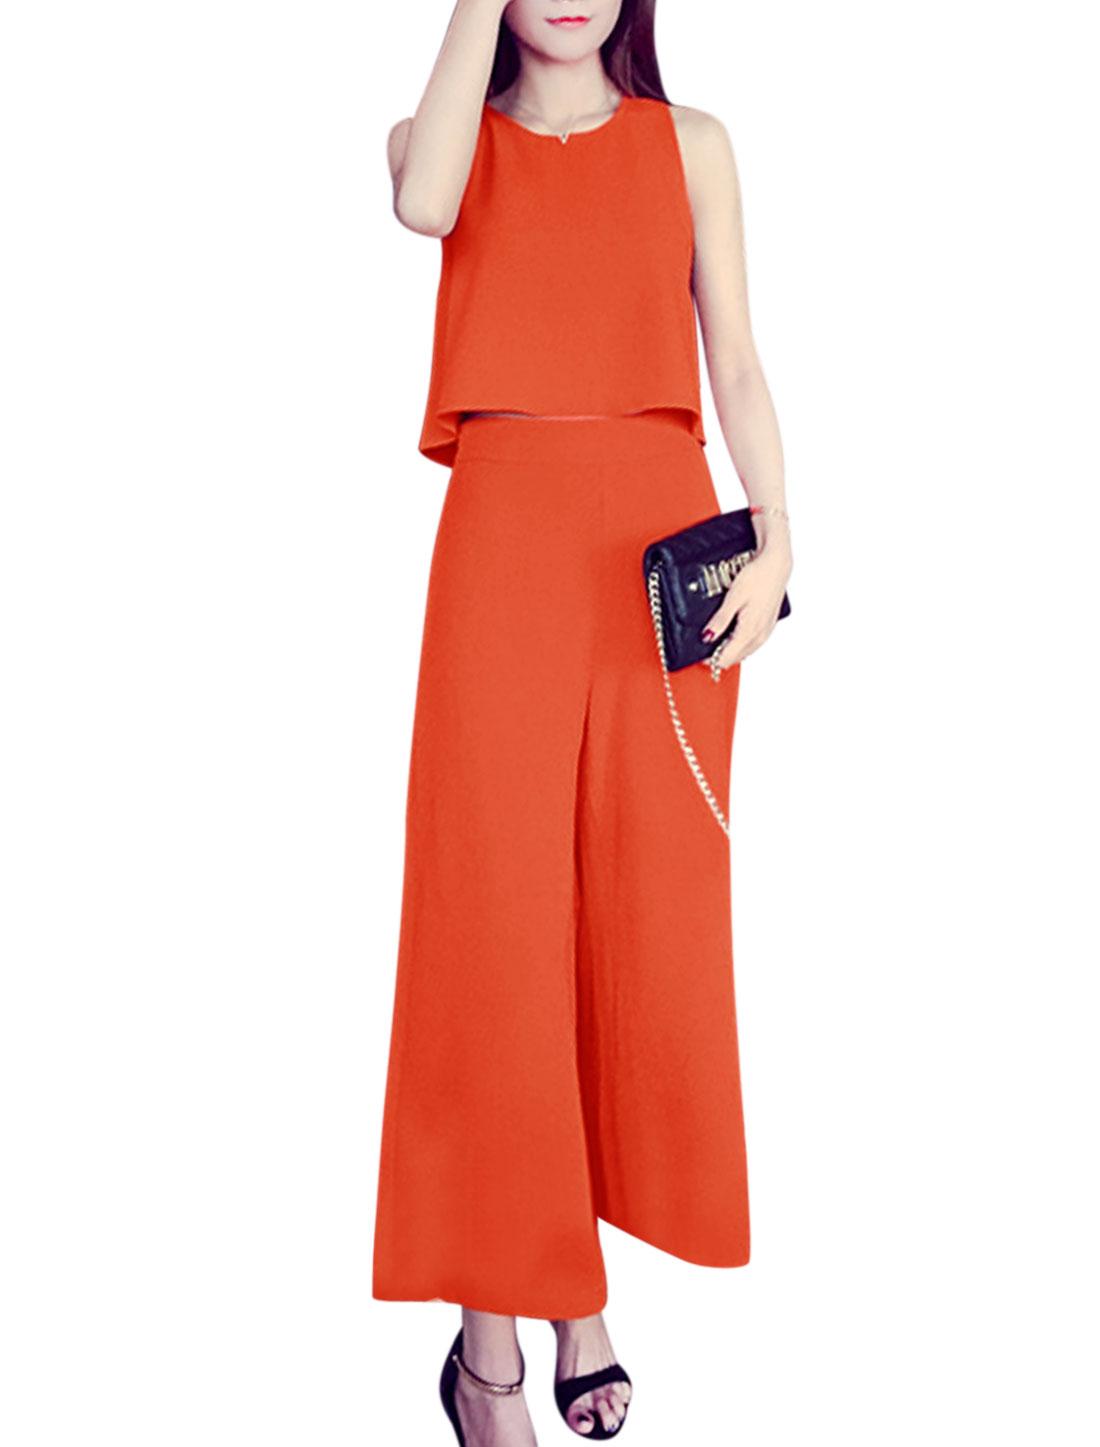 Women Sleeveless Loose Tops w Wide Leg Cropped Pants Set Orange Red S